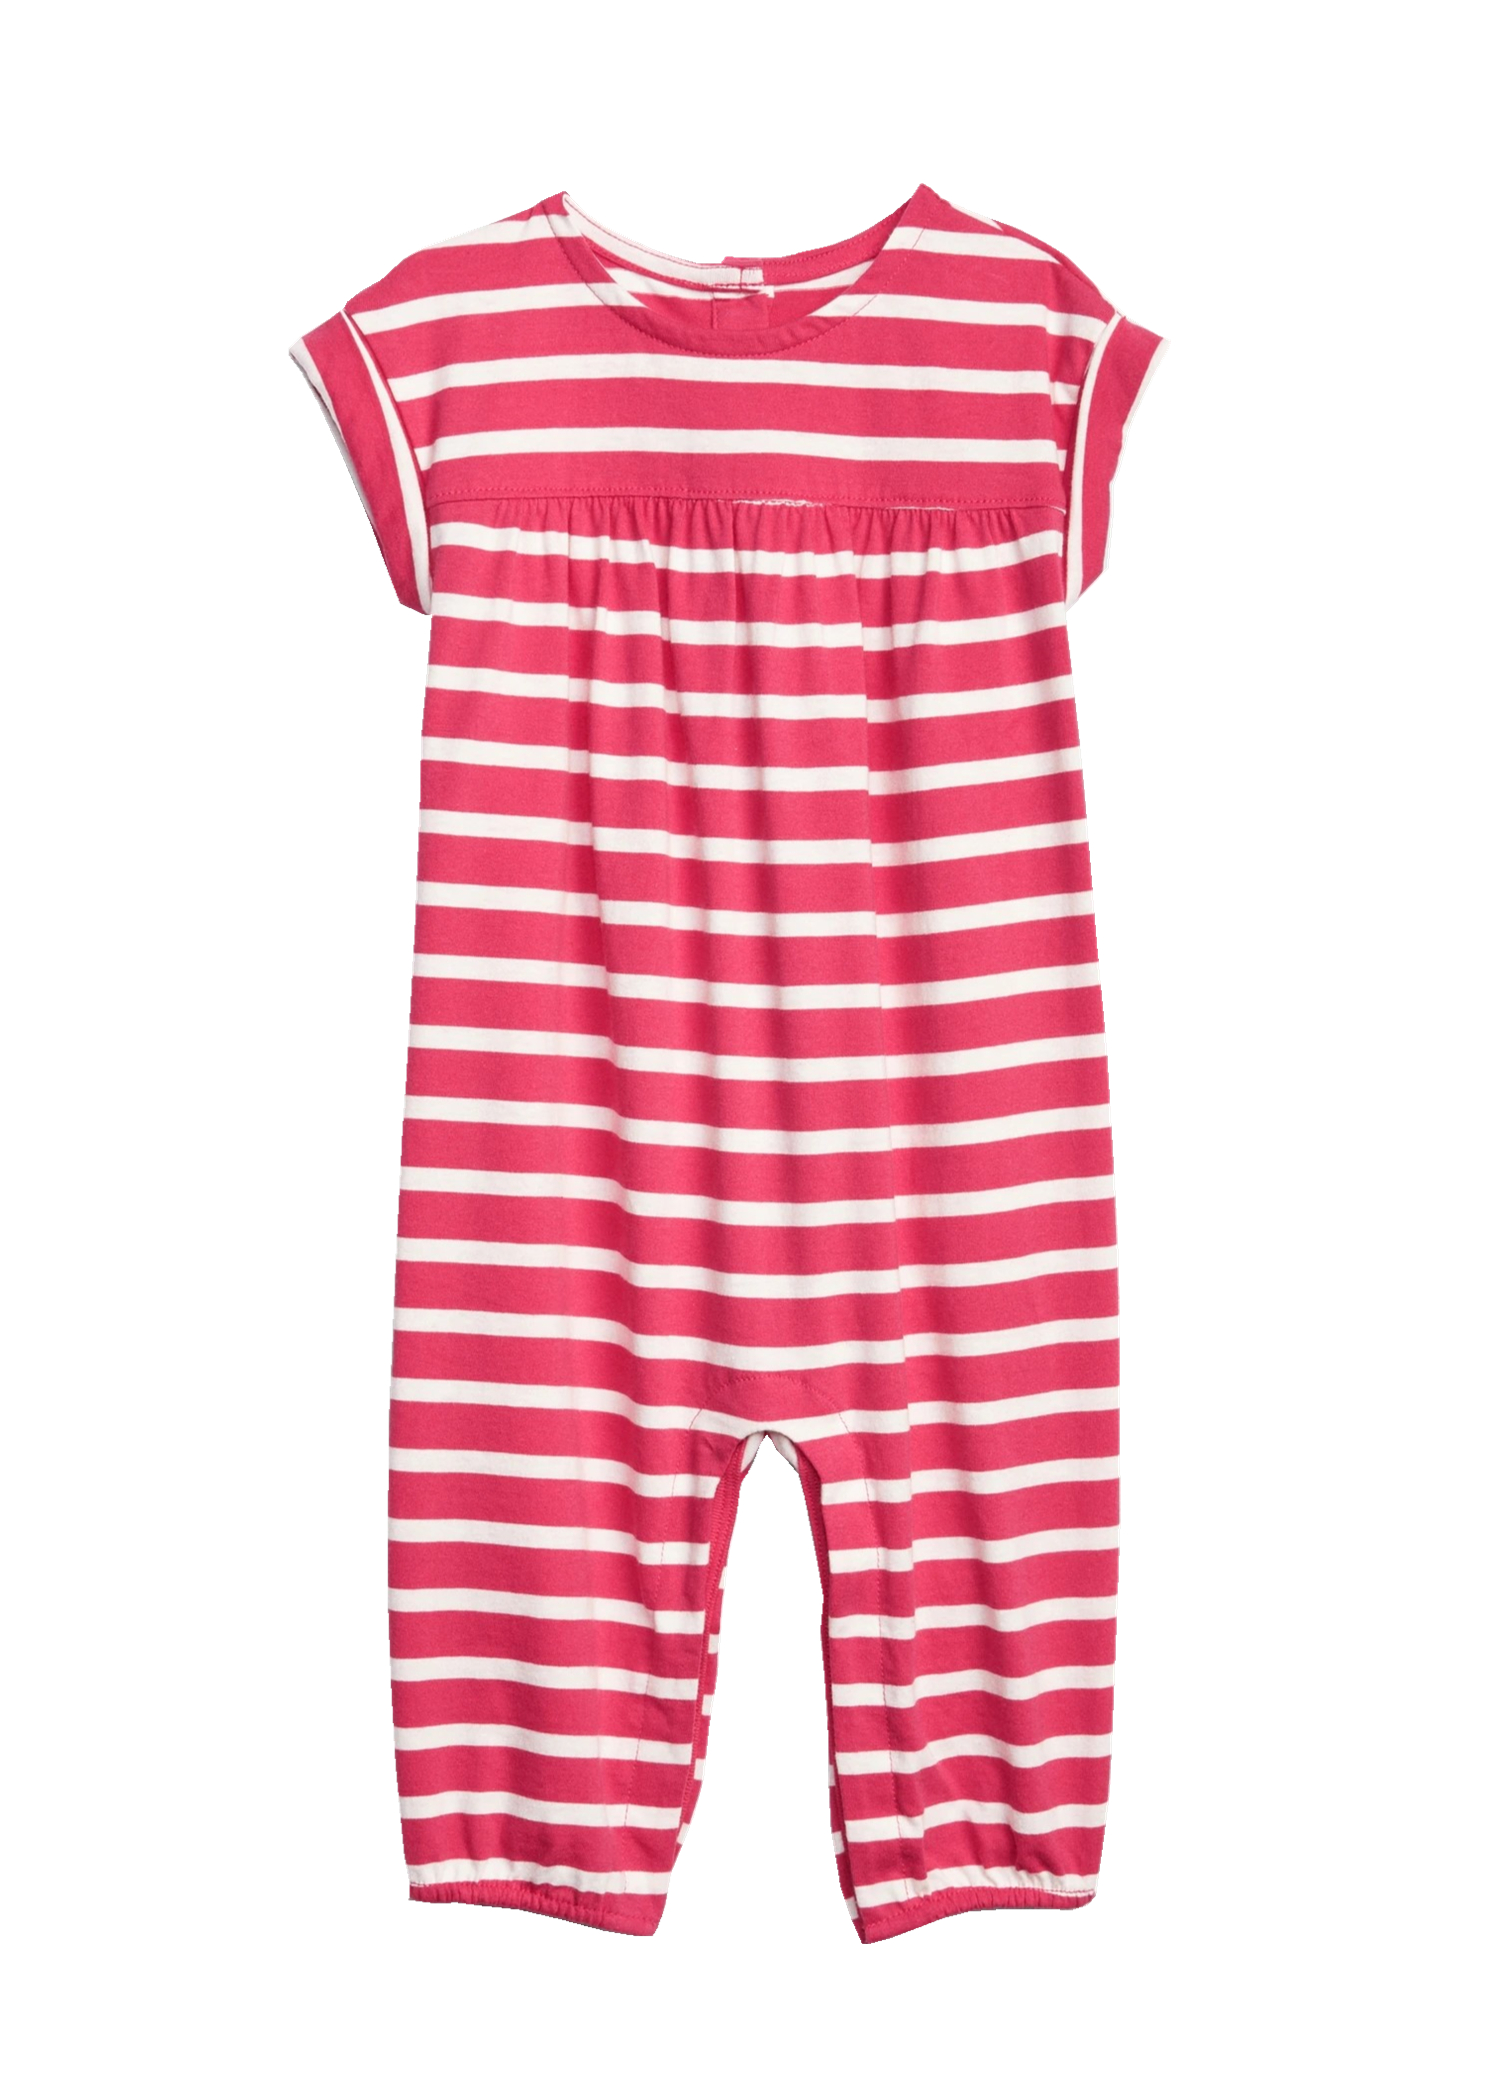 Outer single summer thin stripe one-piece short climbing sleeveless long leg climbing clothes baby one-piece clothes baby clothes 6-12m18m